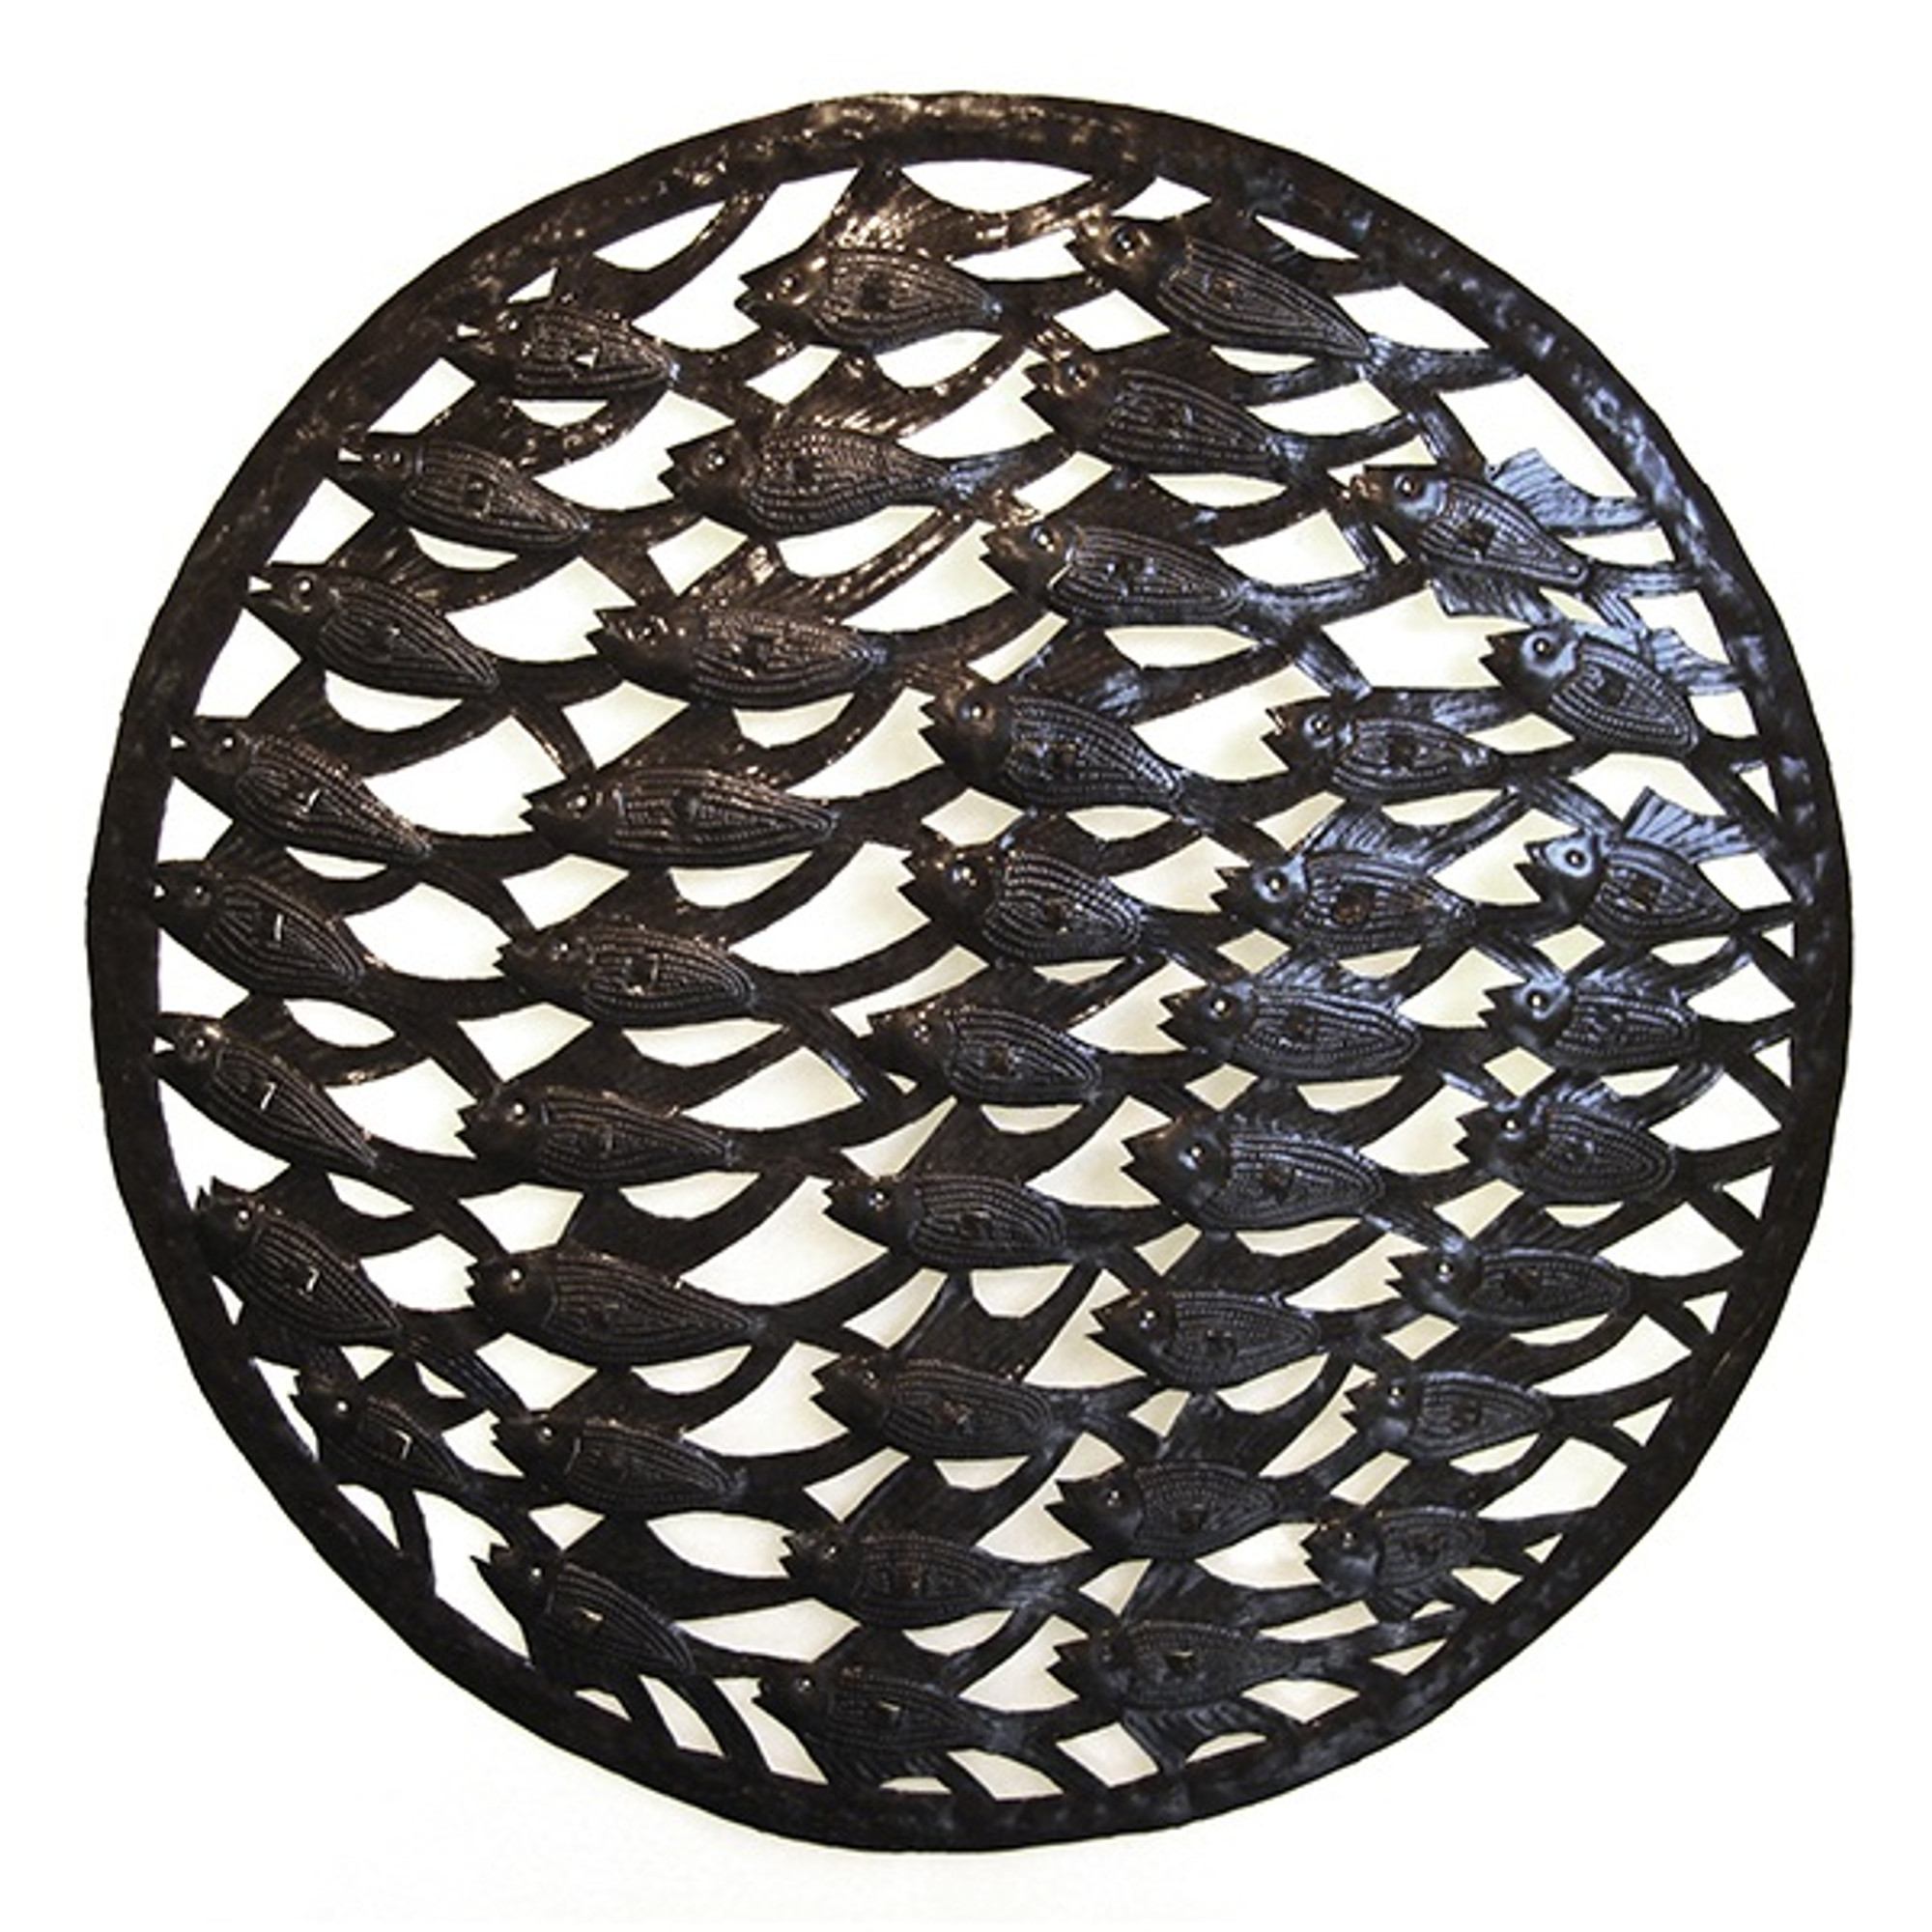 School of fish metal wall scuplture fish outdoor decor for School of fish metal wall art